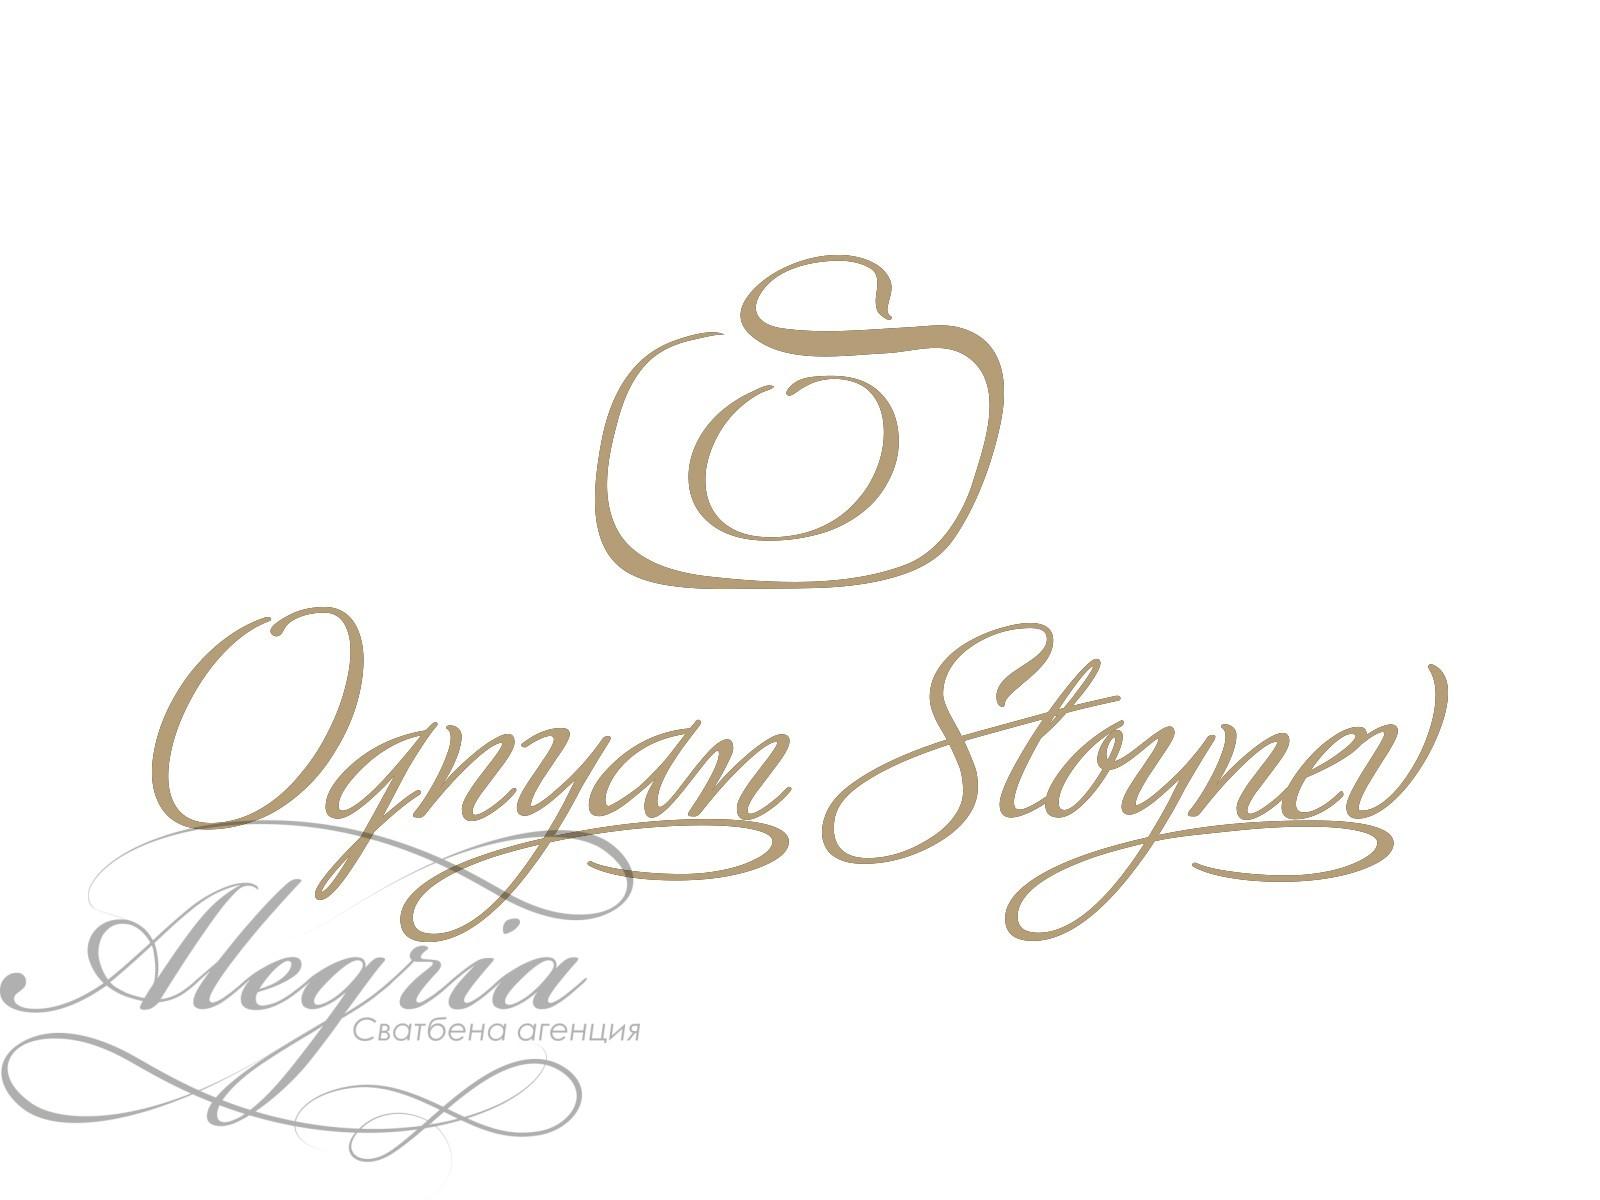 Ognyan Stoynev Photography